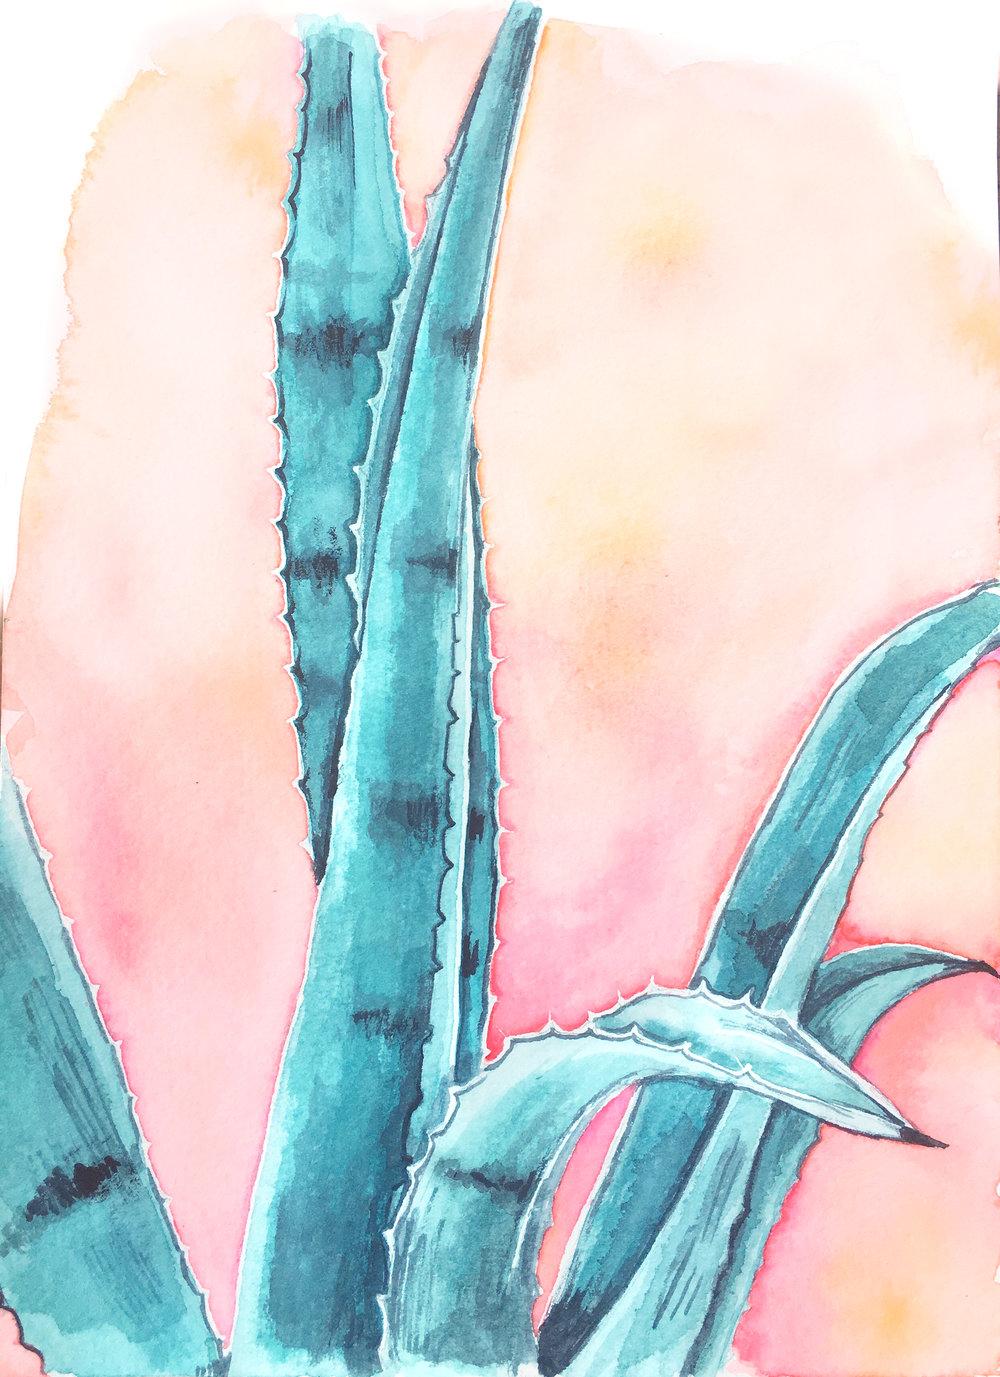 agave on pink edit.jpg